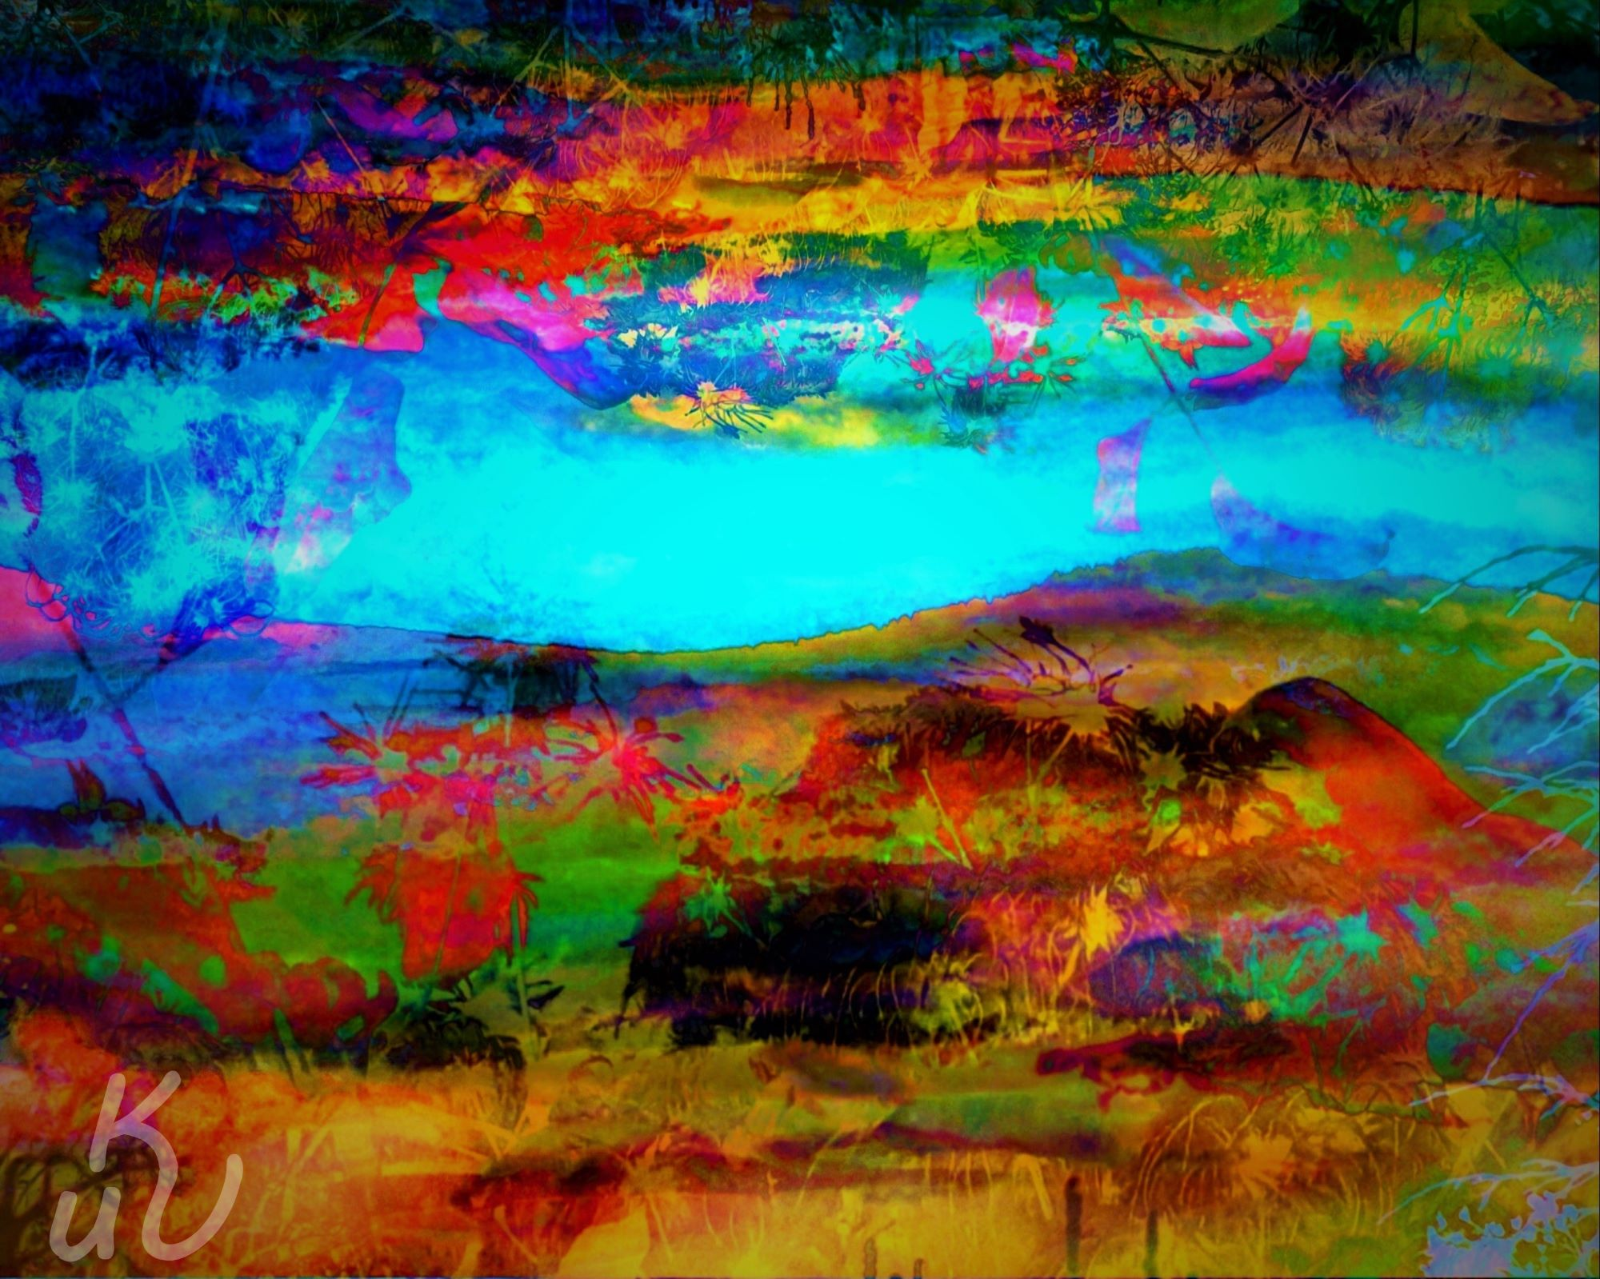 Seeblick von Silke Lotta Gonzalez Leon